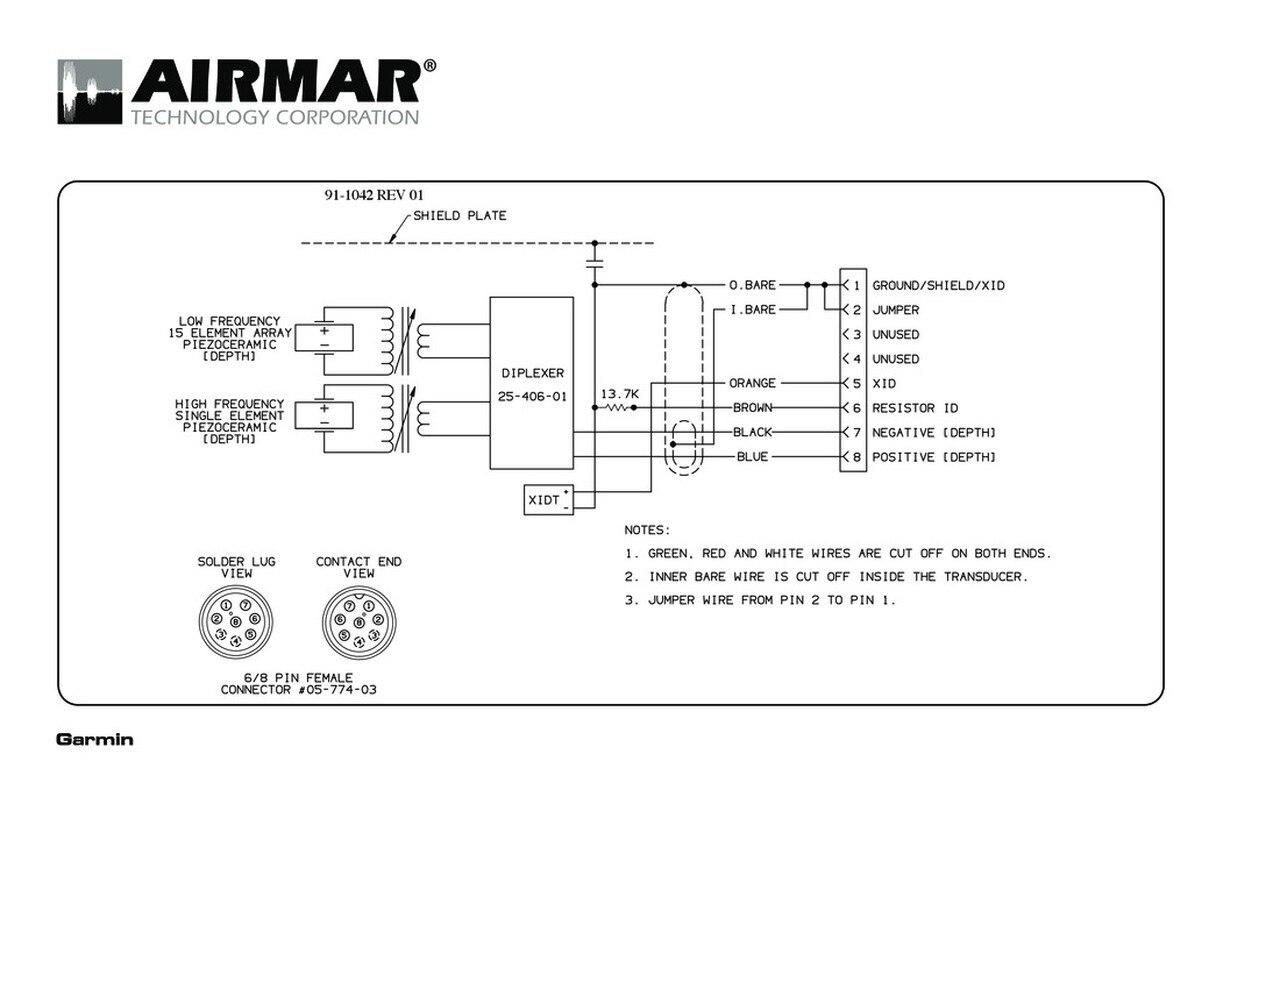 oo_3673] garmin 441s wiring diagram garmin 5212 chartplotter marine wiring diagram  ical gram botse itis viewor mohammedshrine librar wiring 101